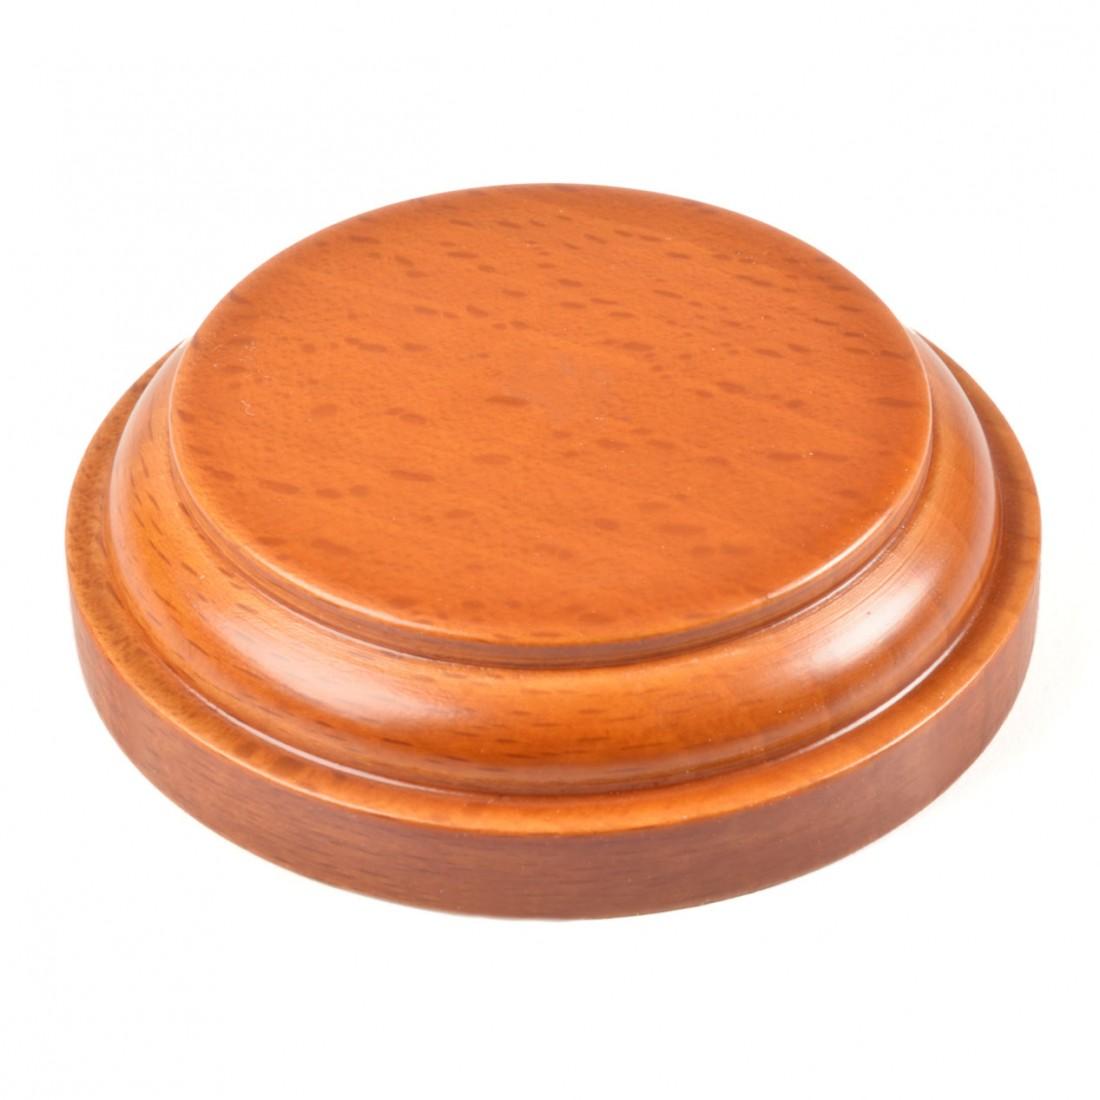 Base redonda de madera mm.70 barnizada.